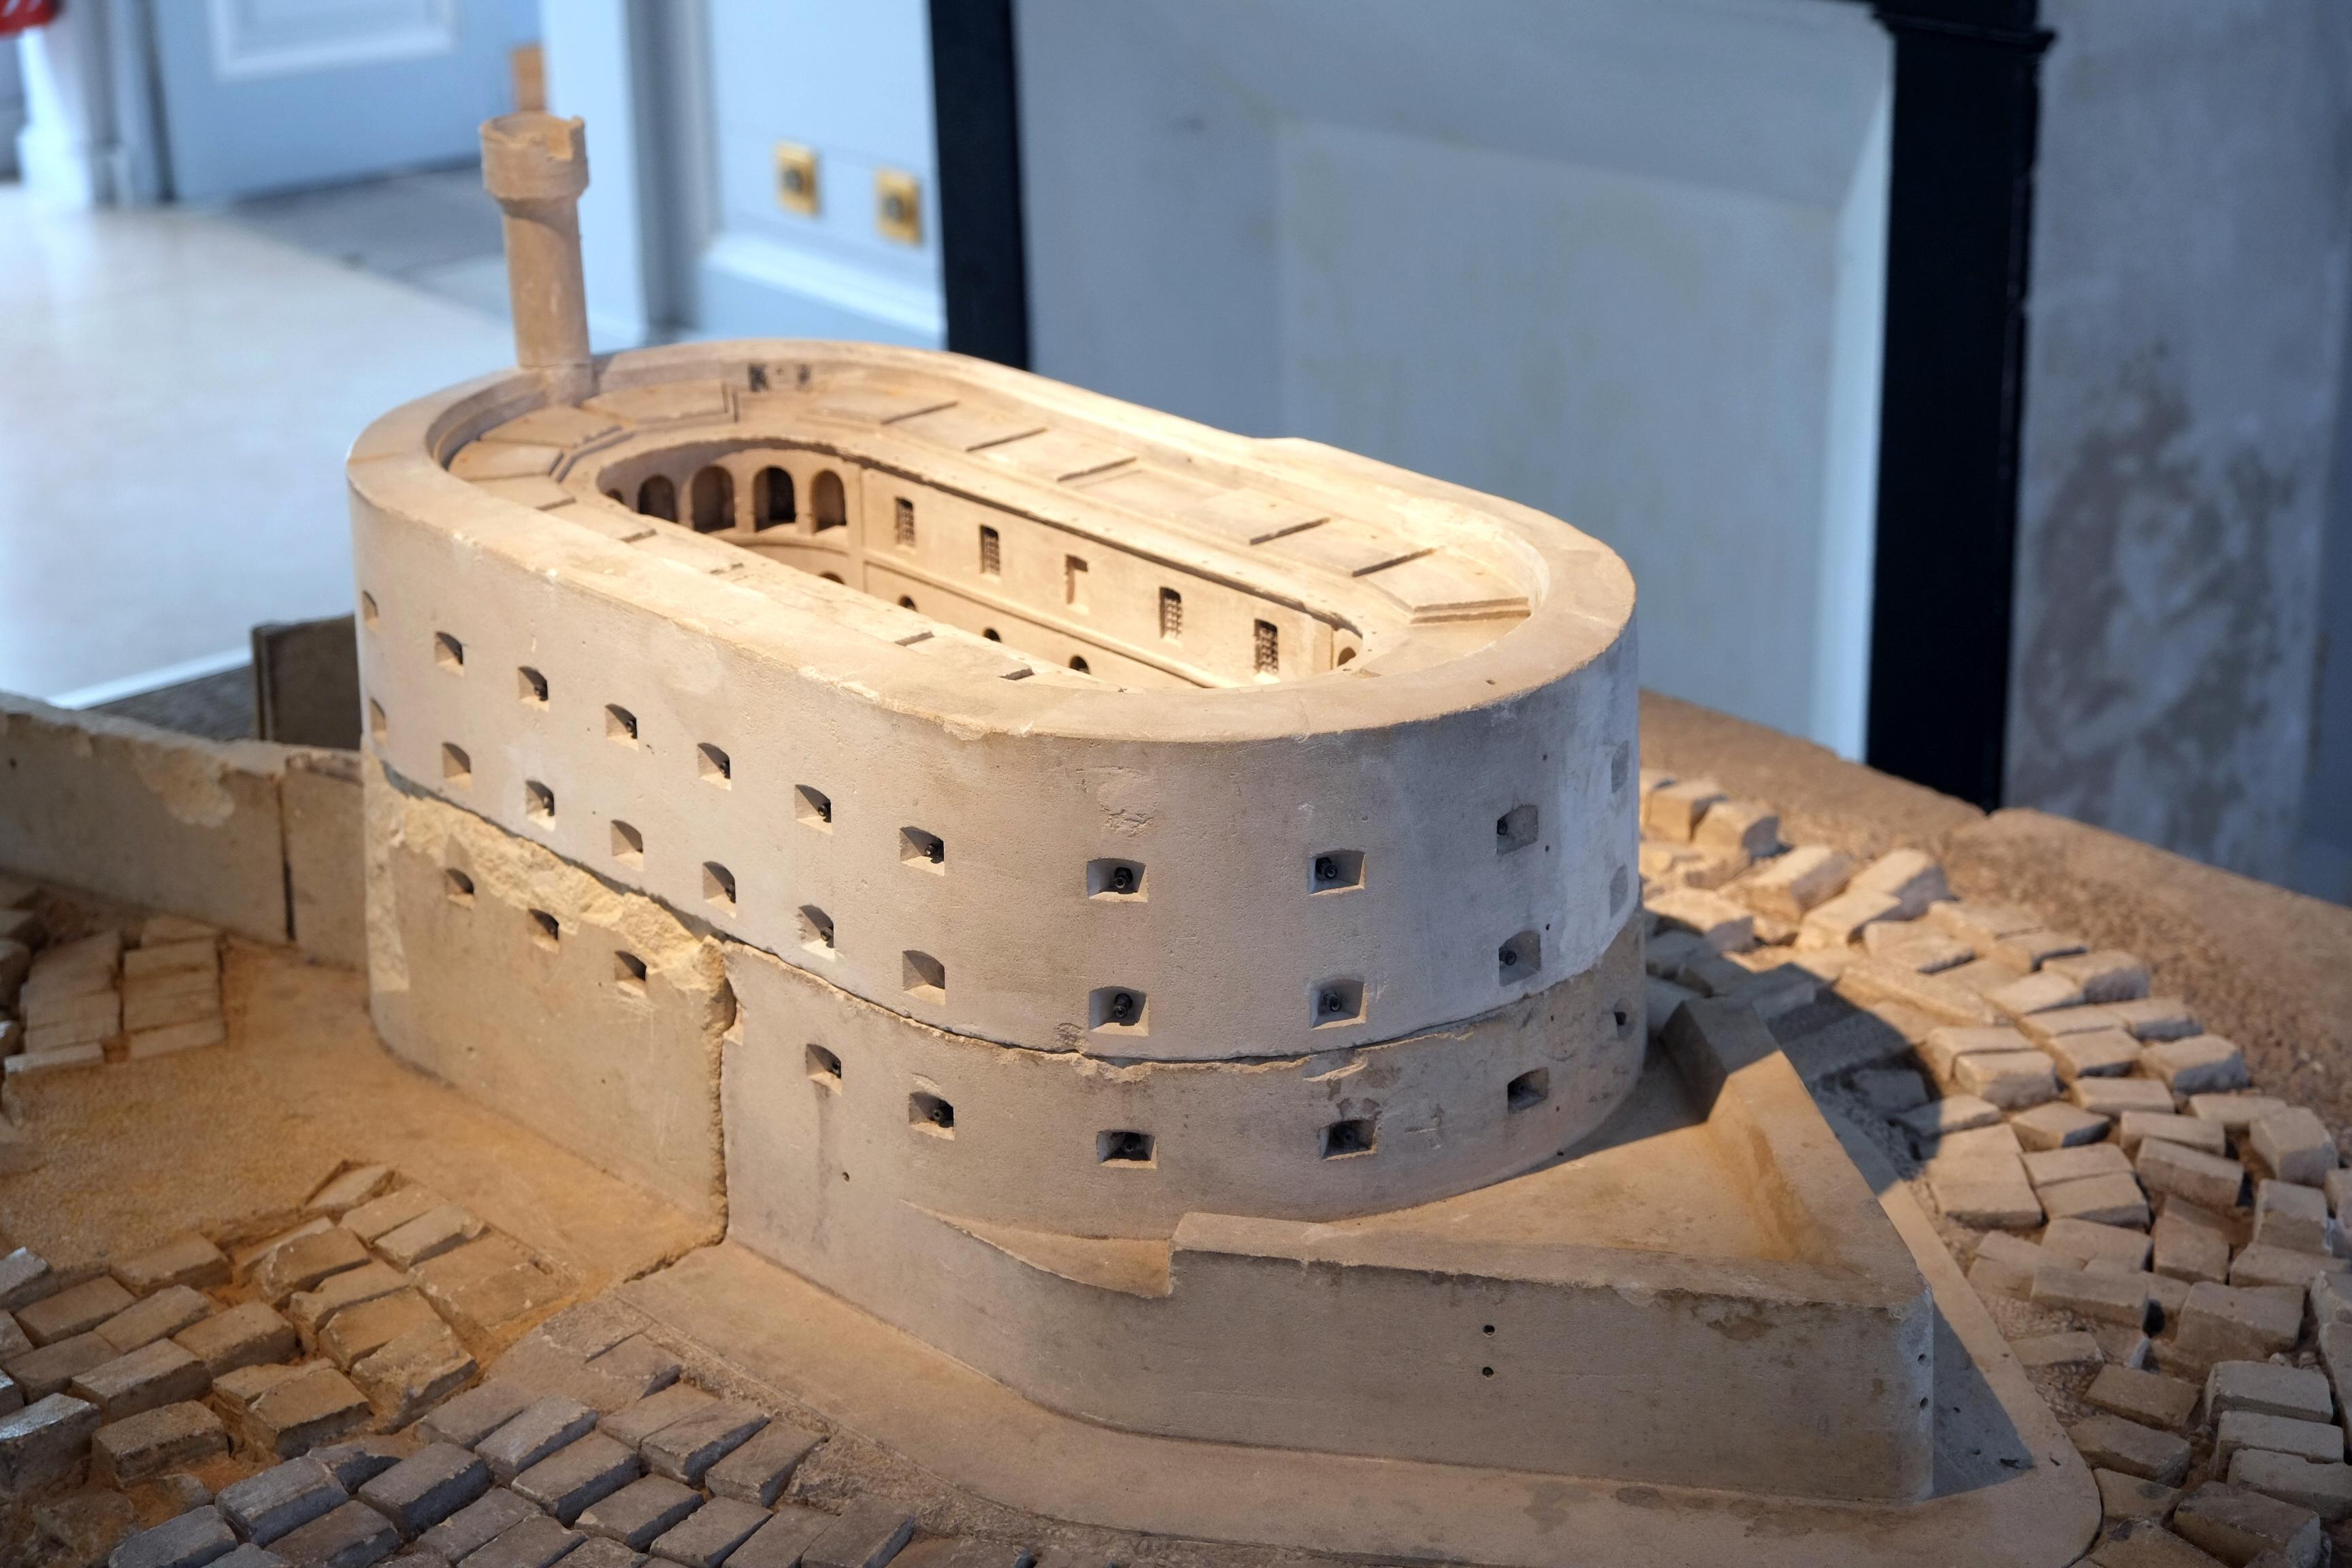 File:079 - Maquette du fort Boyard musée de la Marine ...